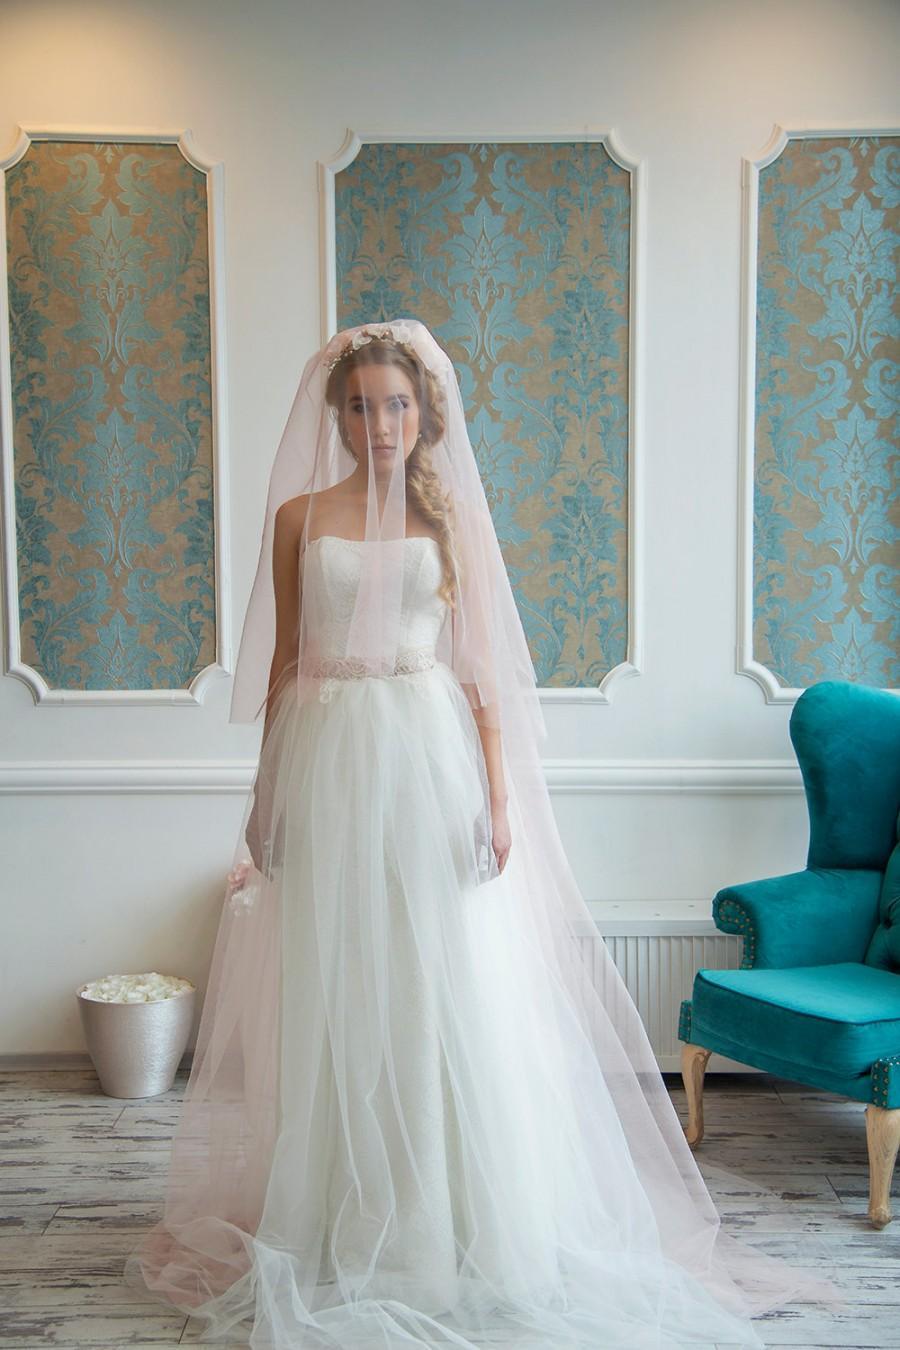 زفاف - Majesty Elizabeth Blush wedding veil Wedding veil,bridal veil,blush,wedding veil fingertip,wedding veil cathedr